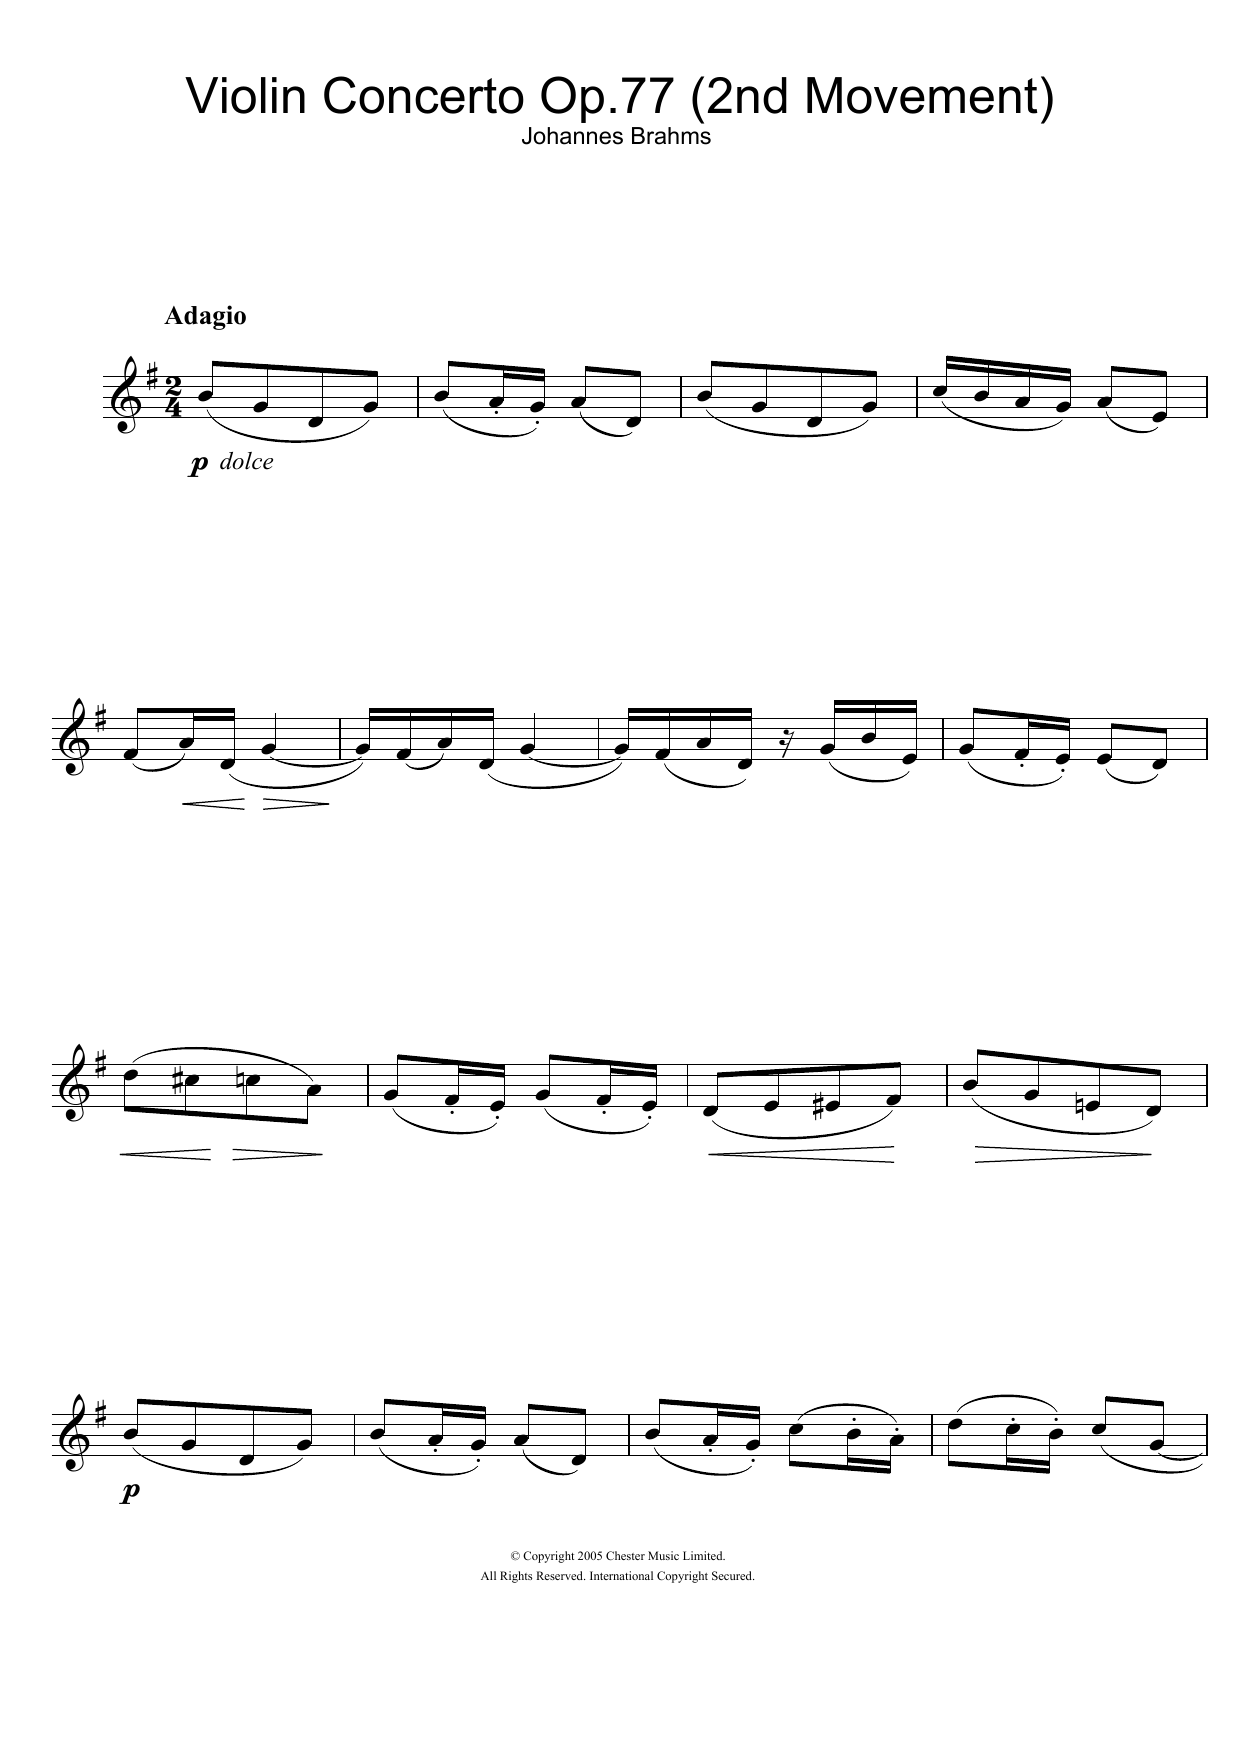 Johannes Brahms - Violin Concerto (2nd Movement)